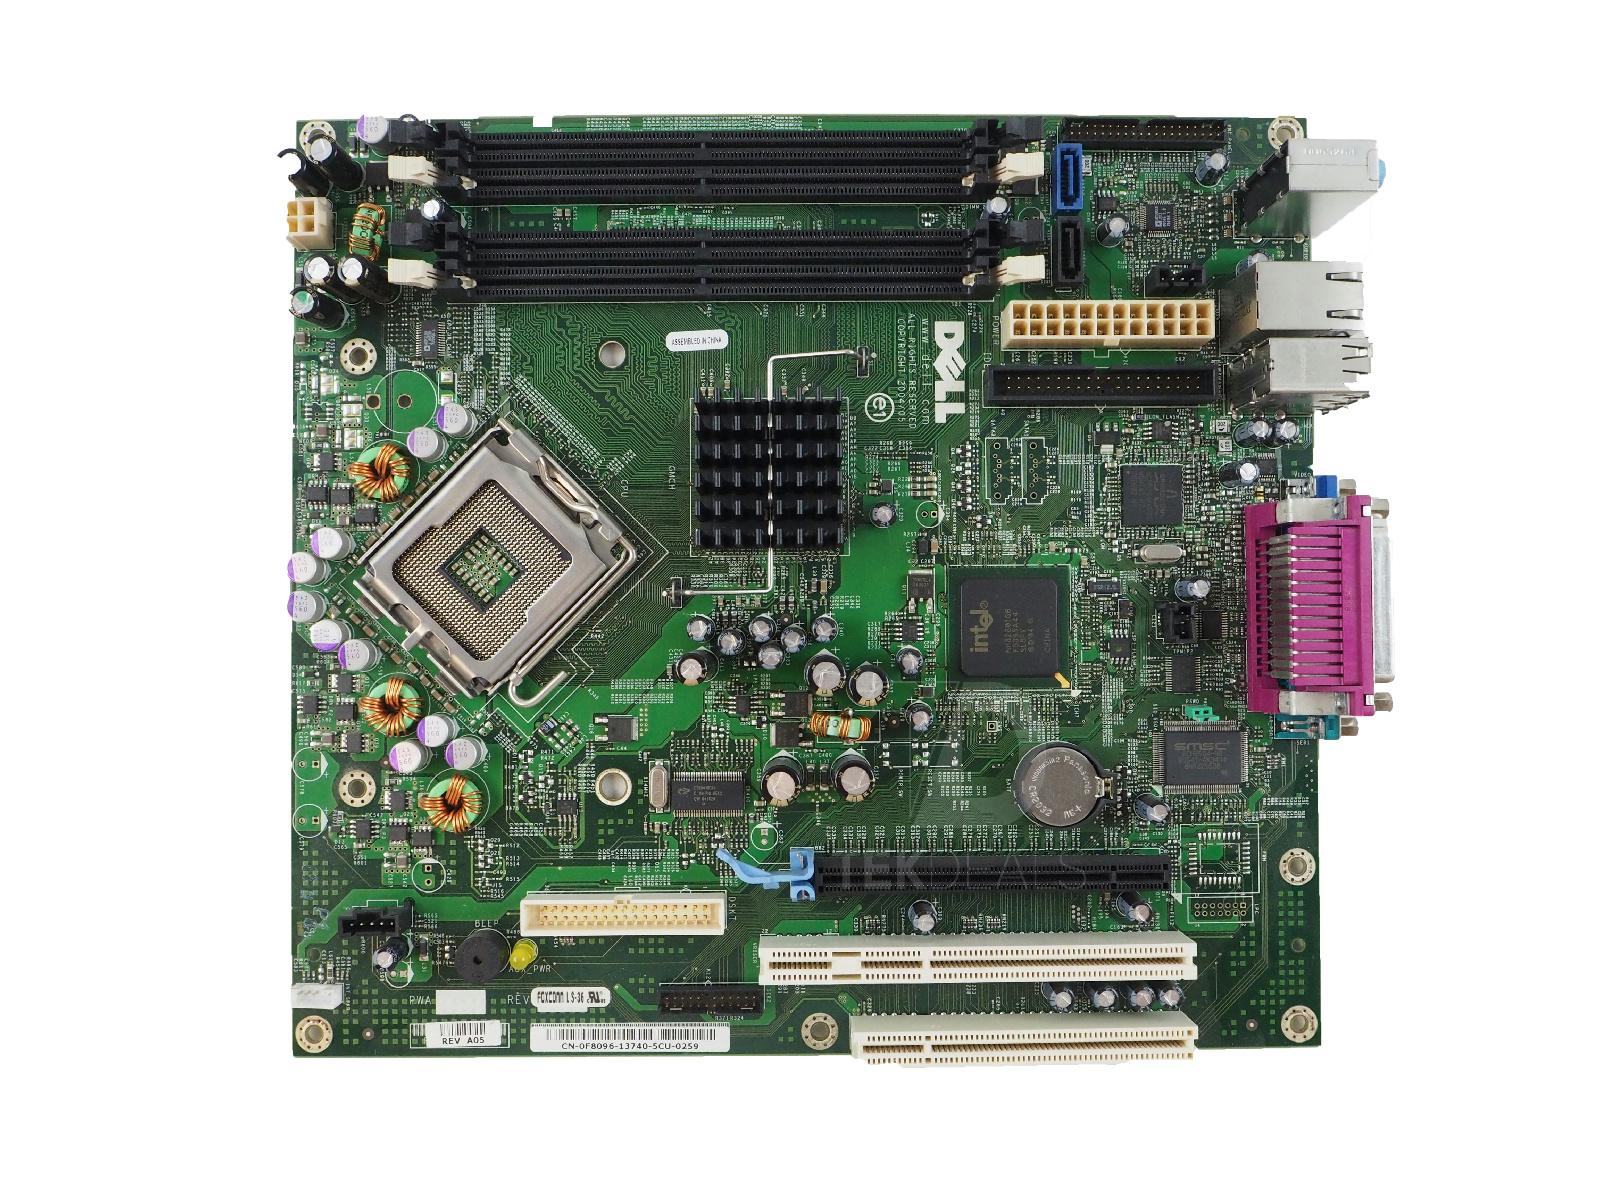 dell f8096 optiplex gx620 desktop system motherboard 5711045166679 rh ebay com Dell Support Optiplex GX620 Dell Optiplex 745 Motherboard Manual